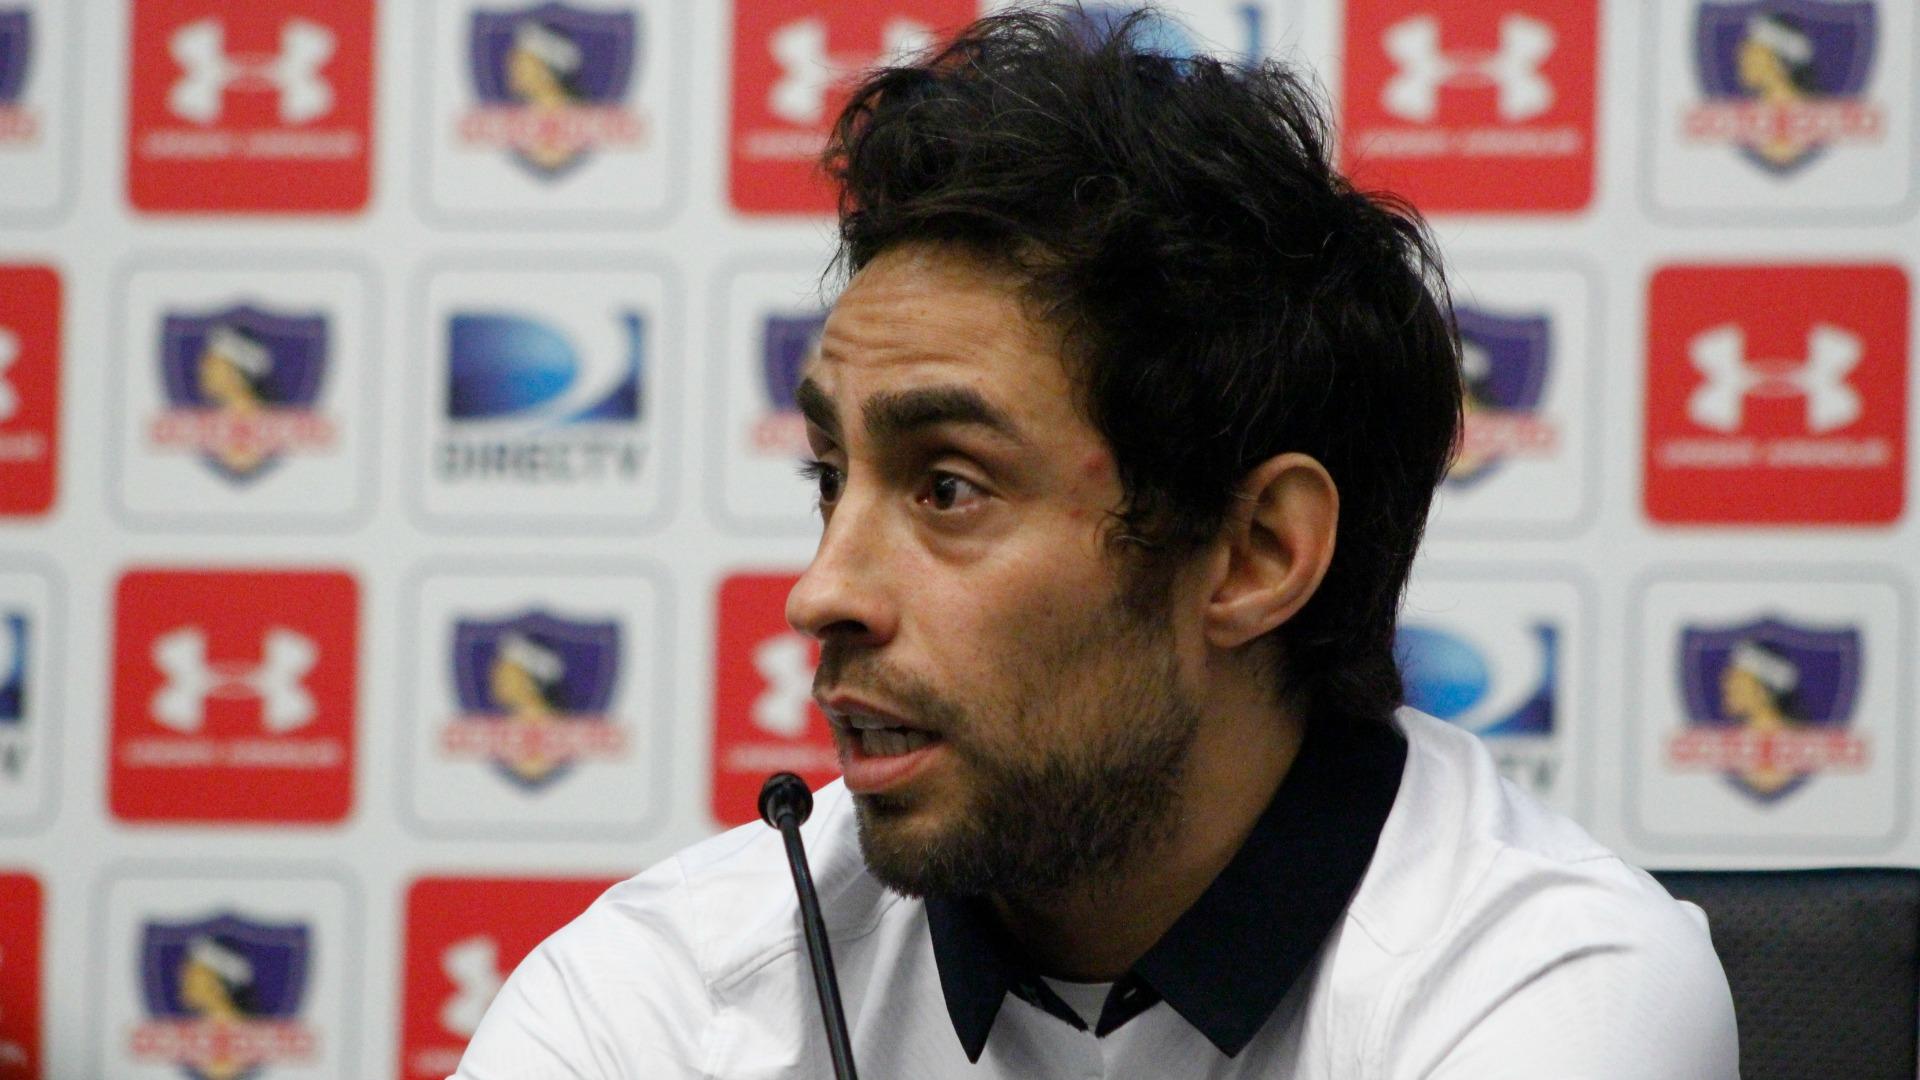 Jorge Valdivia le deseó suerte a la 'Roja':